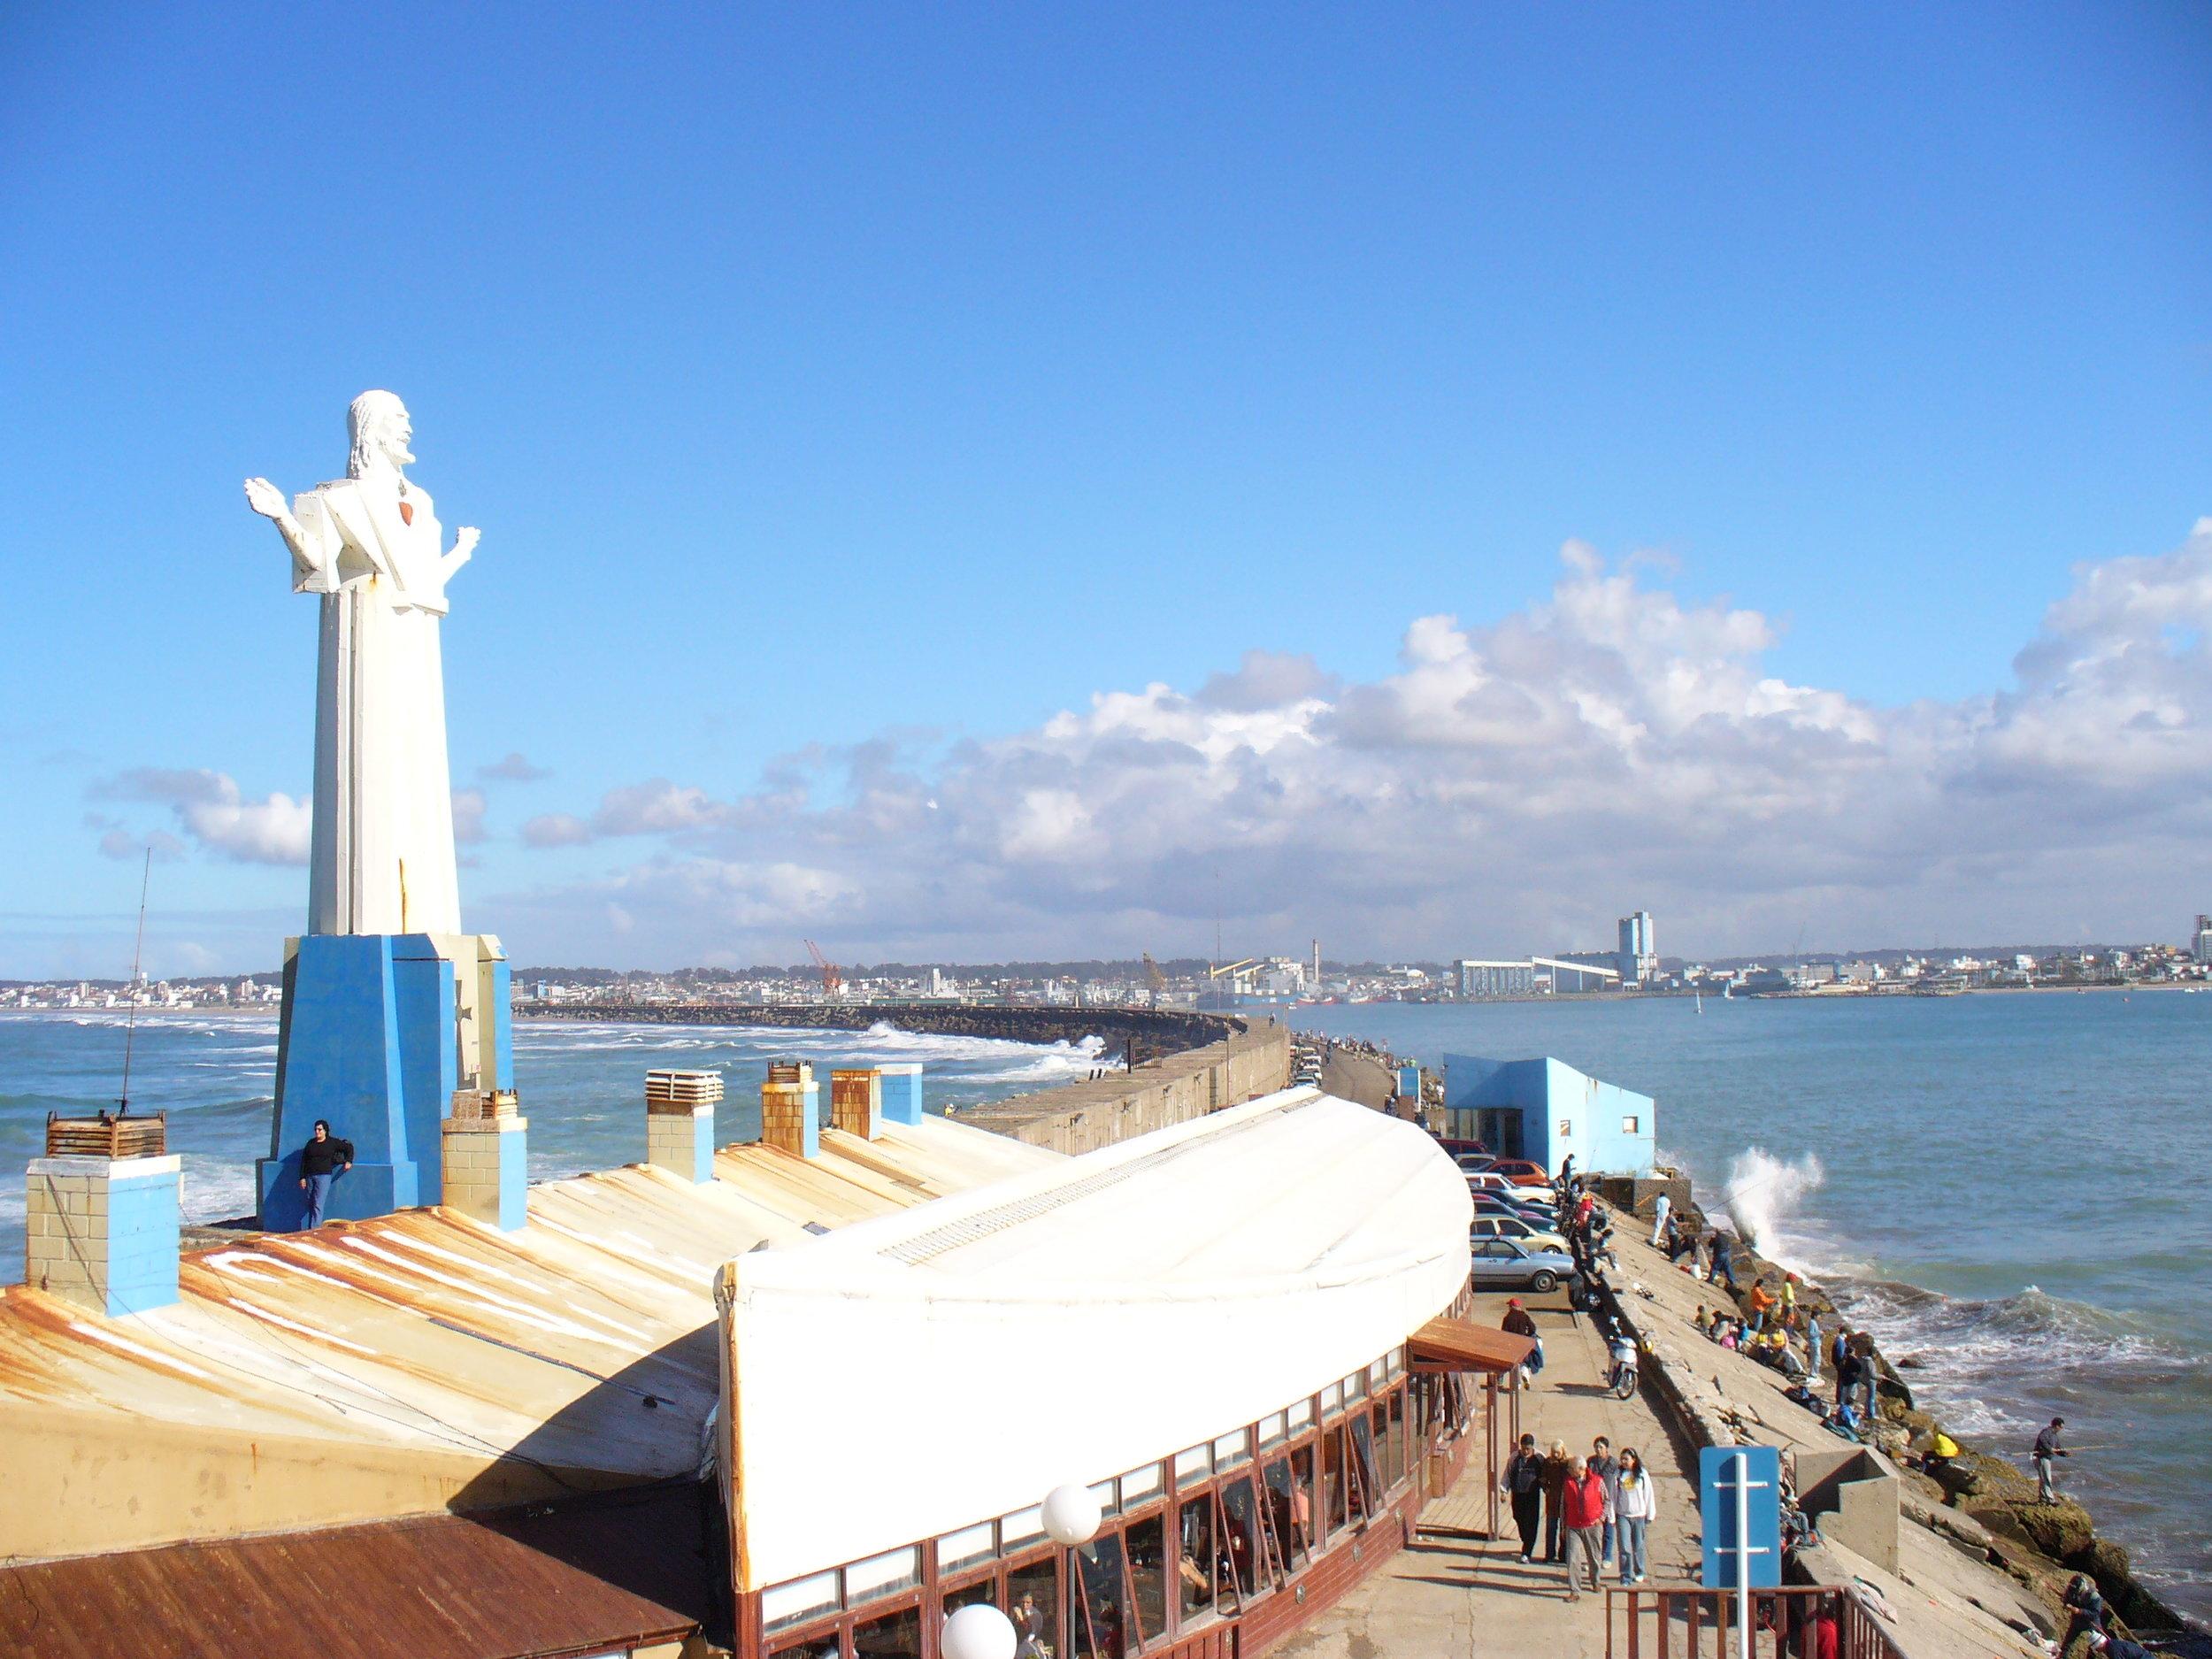 Big Jesus gave us a warm welcome to Mar del Plata, Argentina.